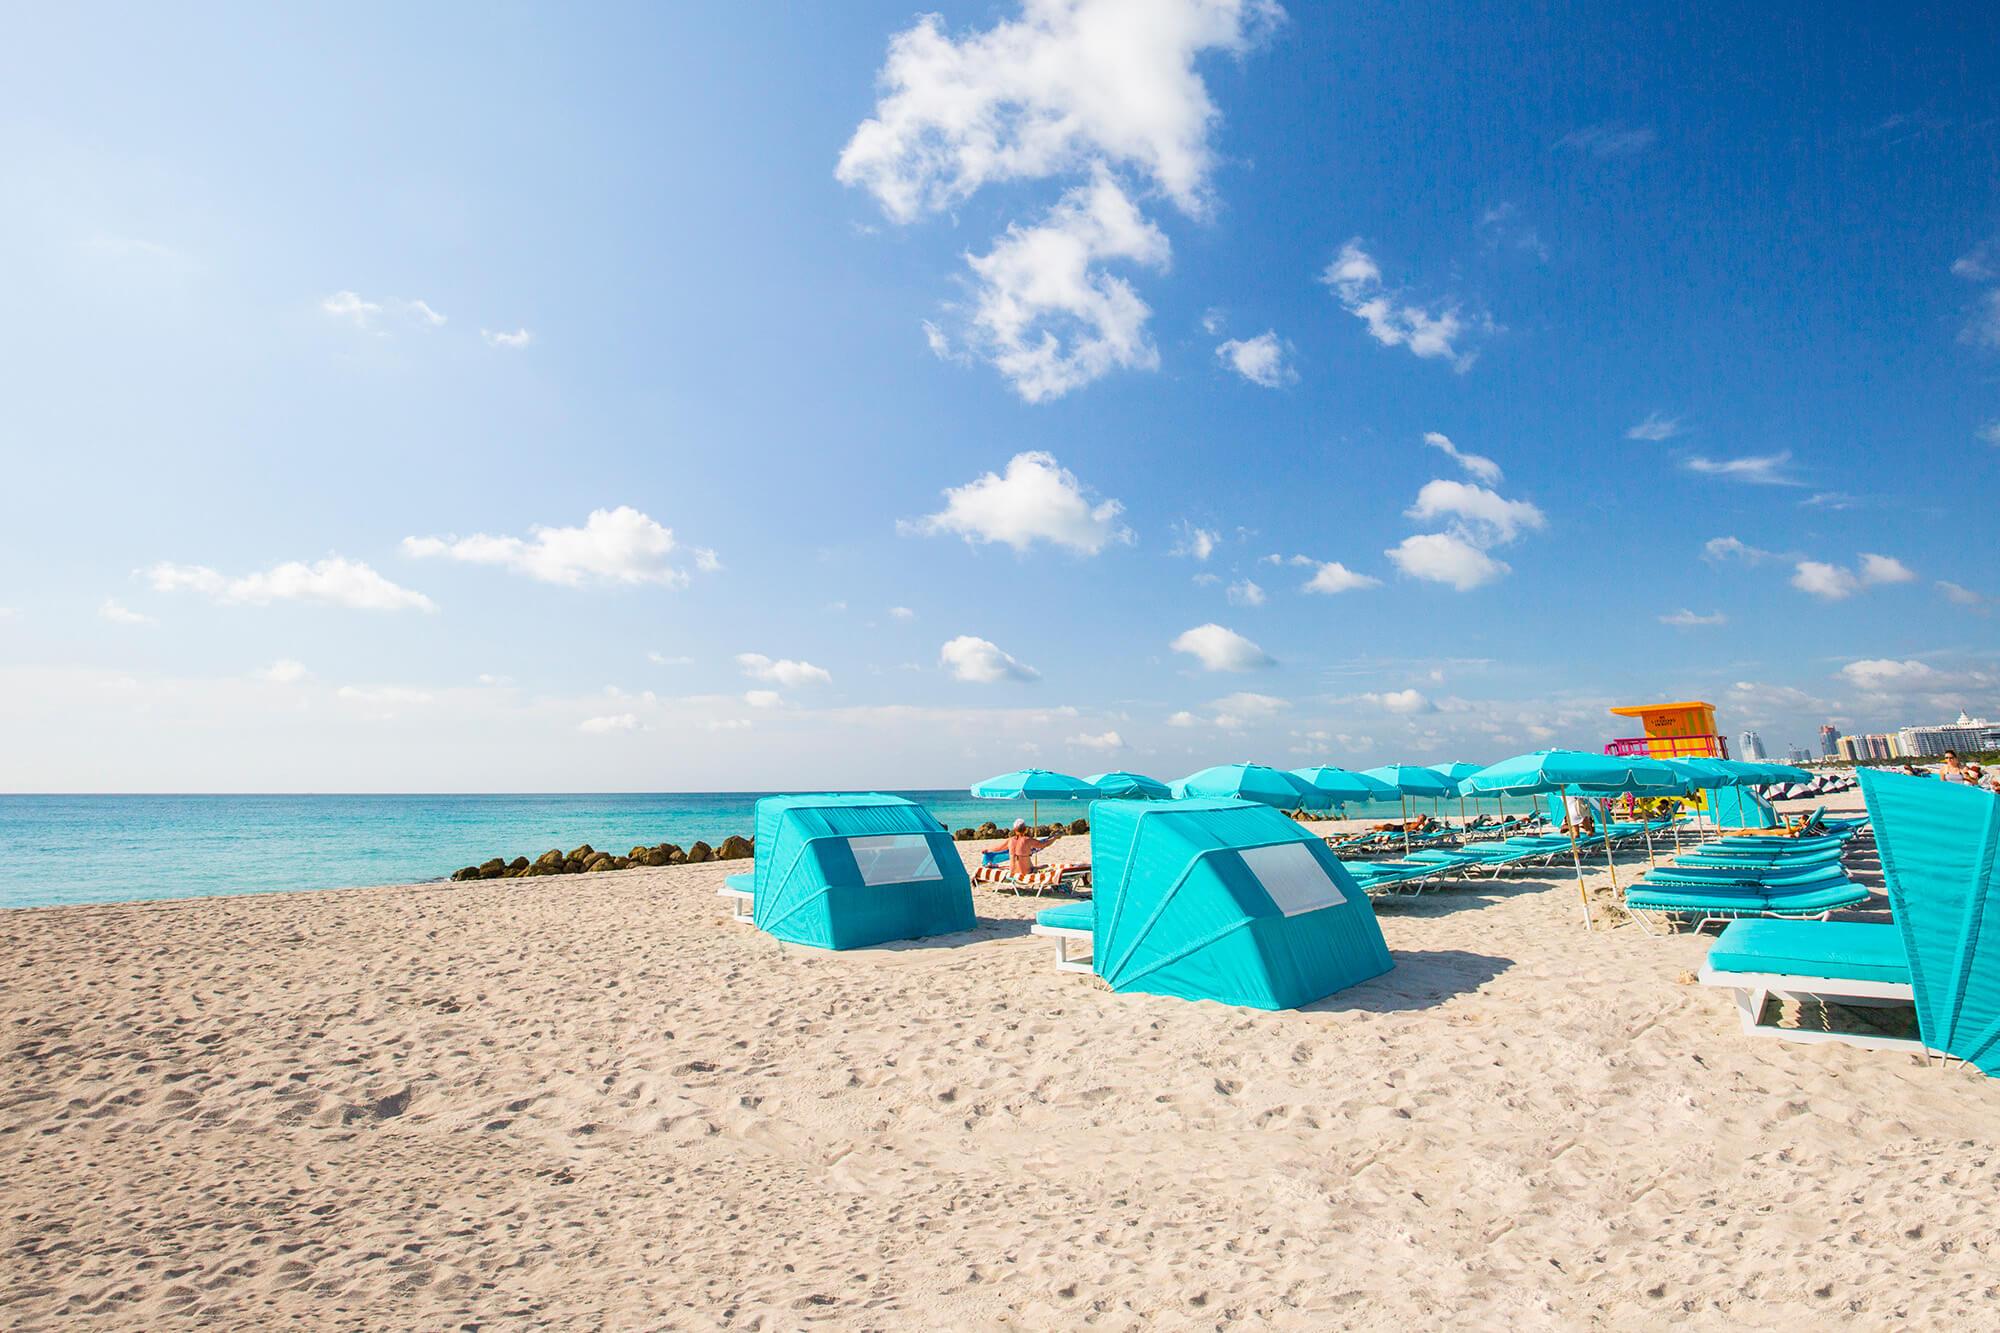 Palms Hotel Miami